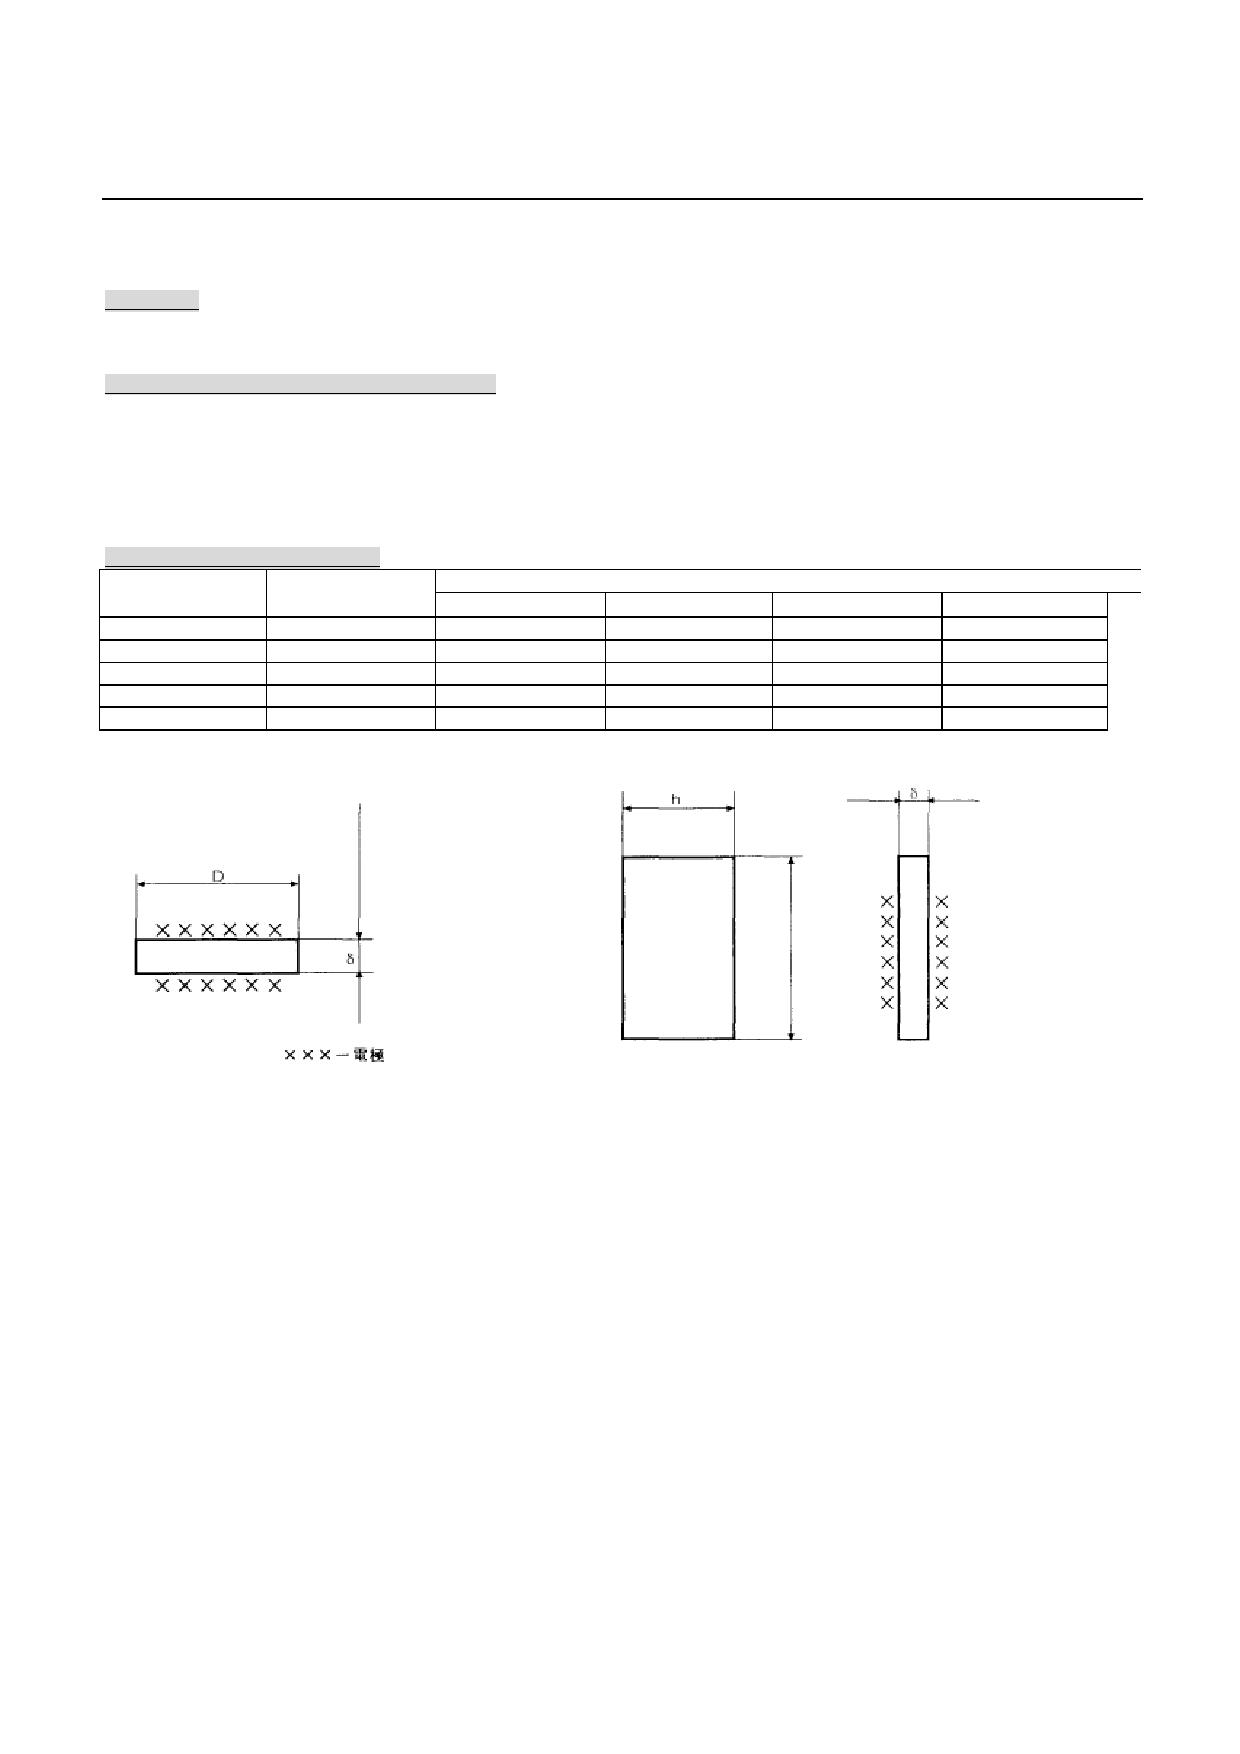 MZ73-9RM diode, scr